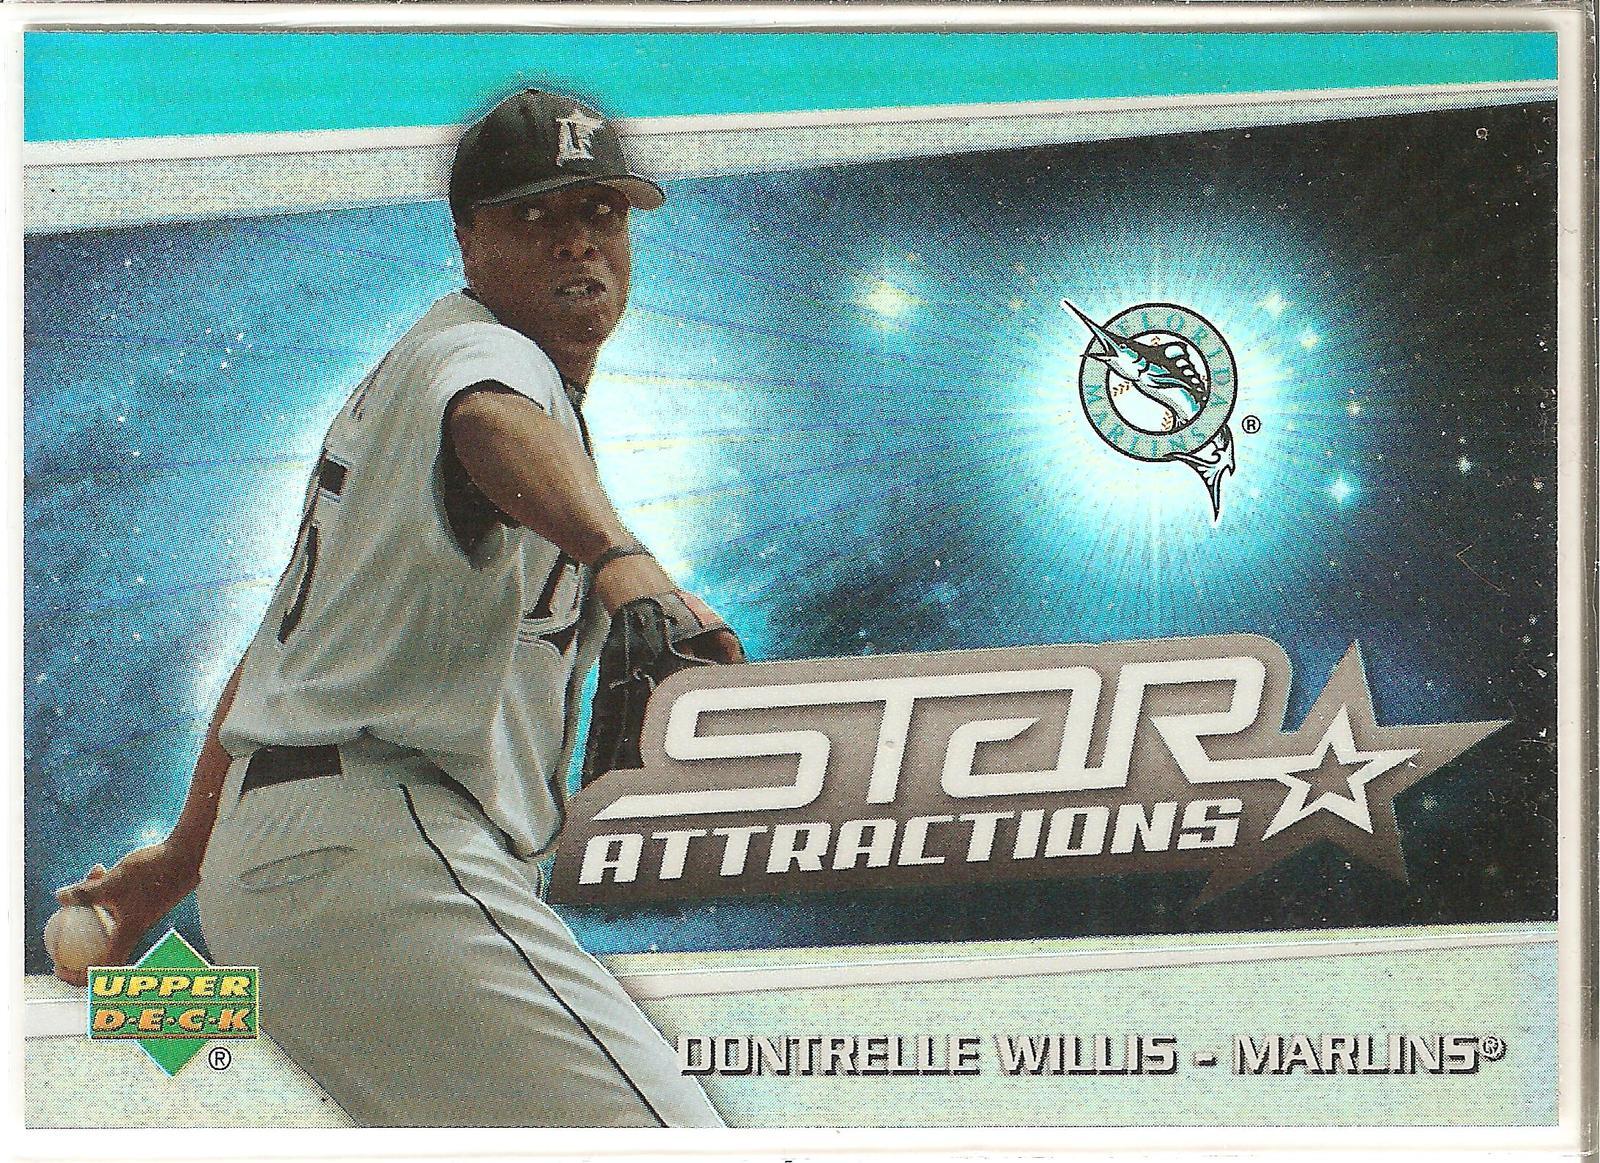 Dontrelle willis 001